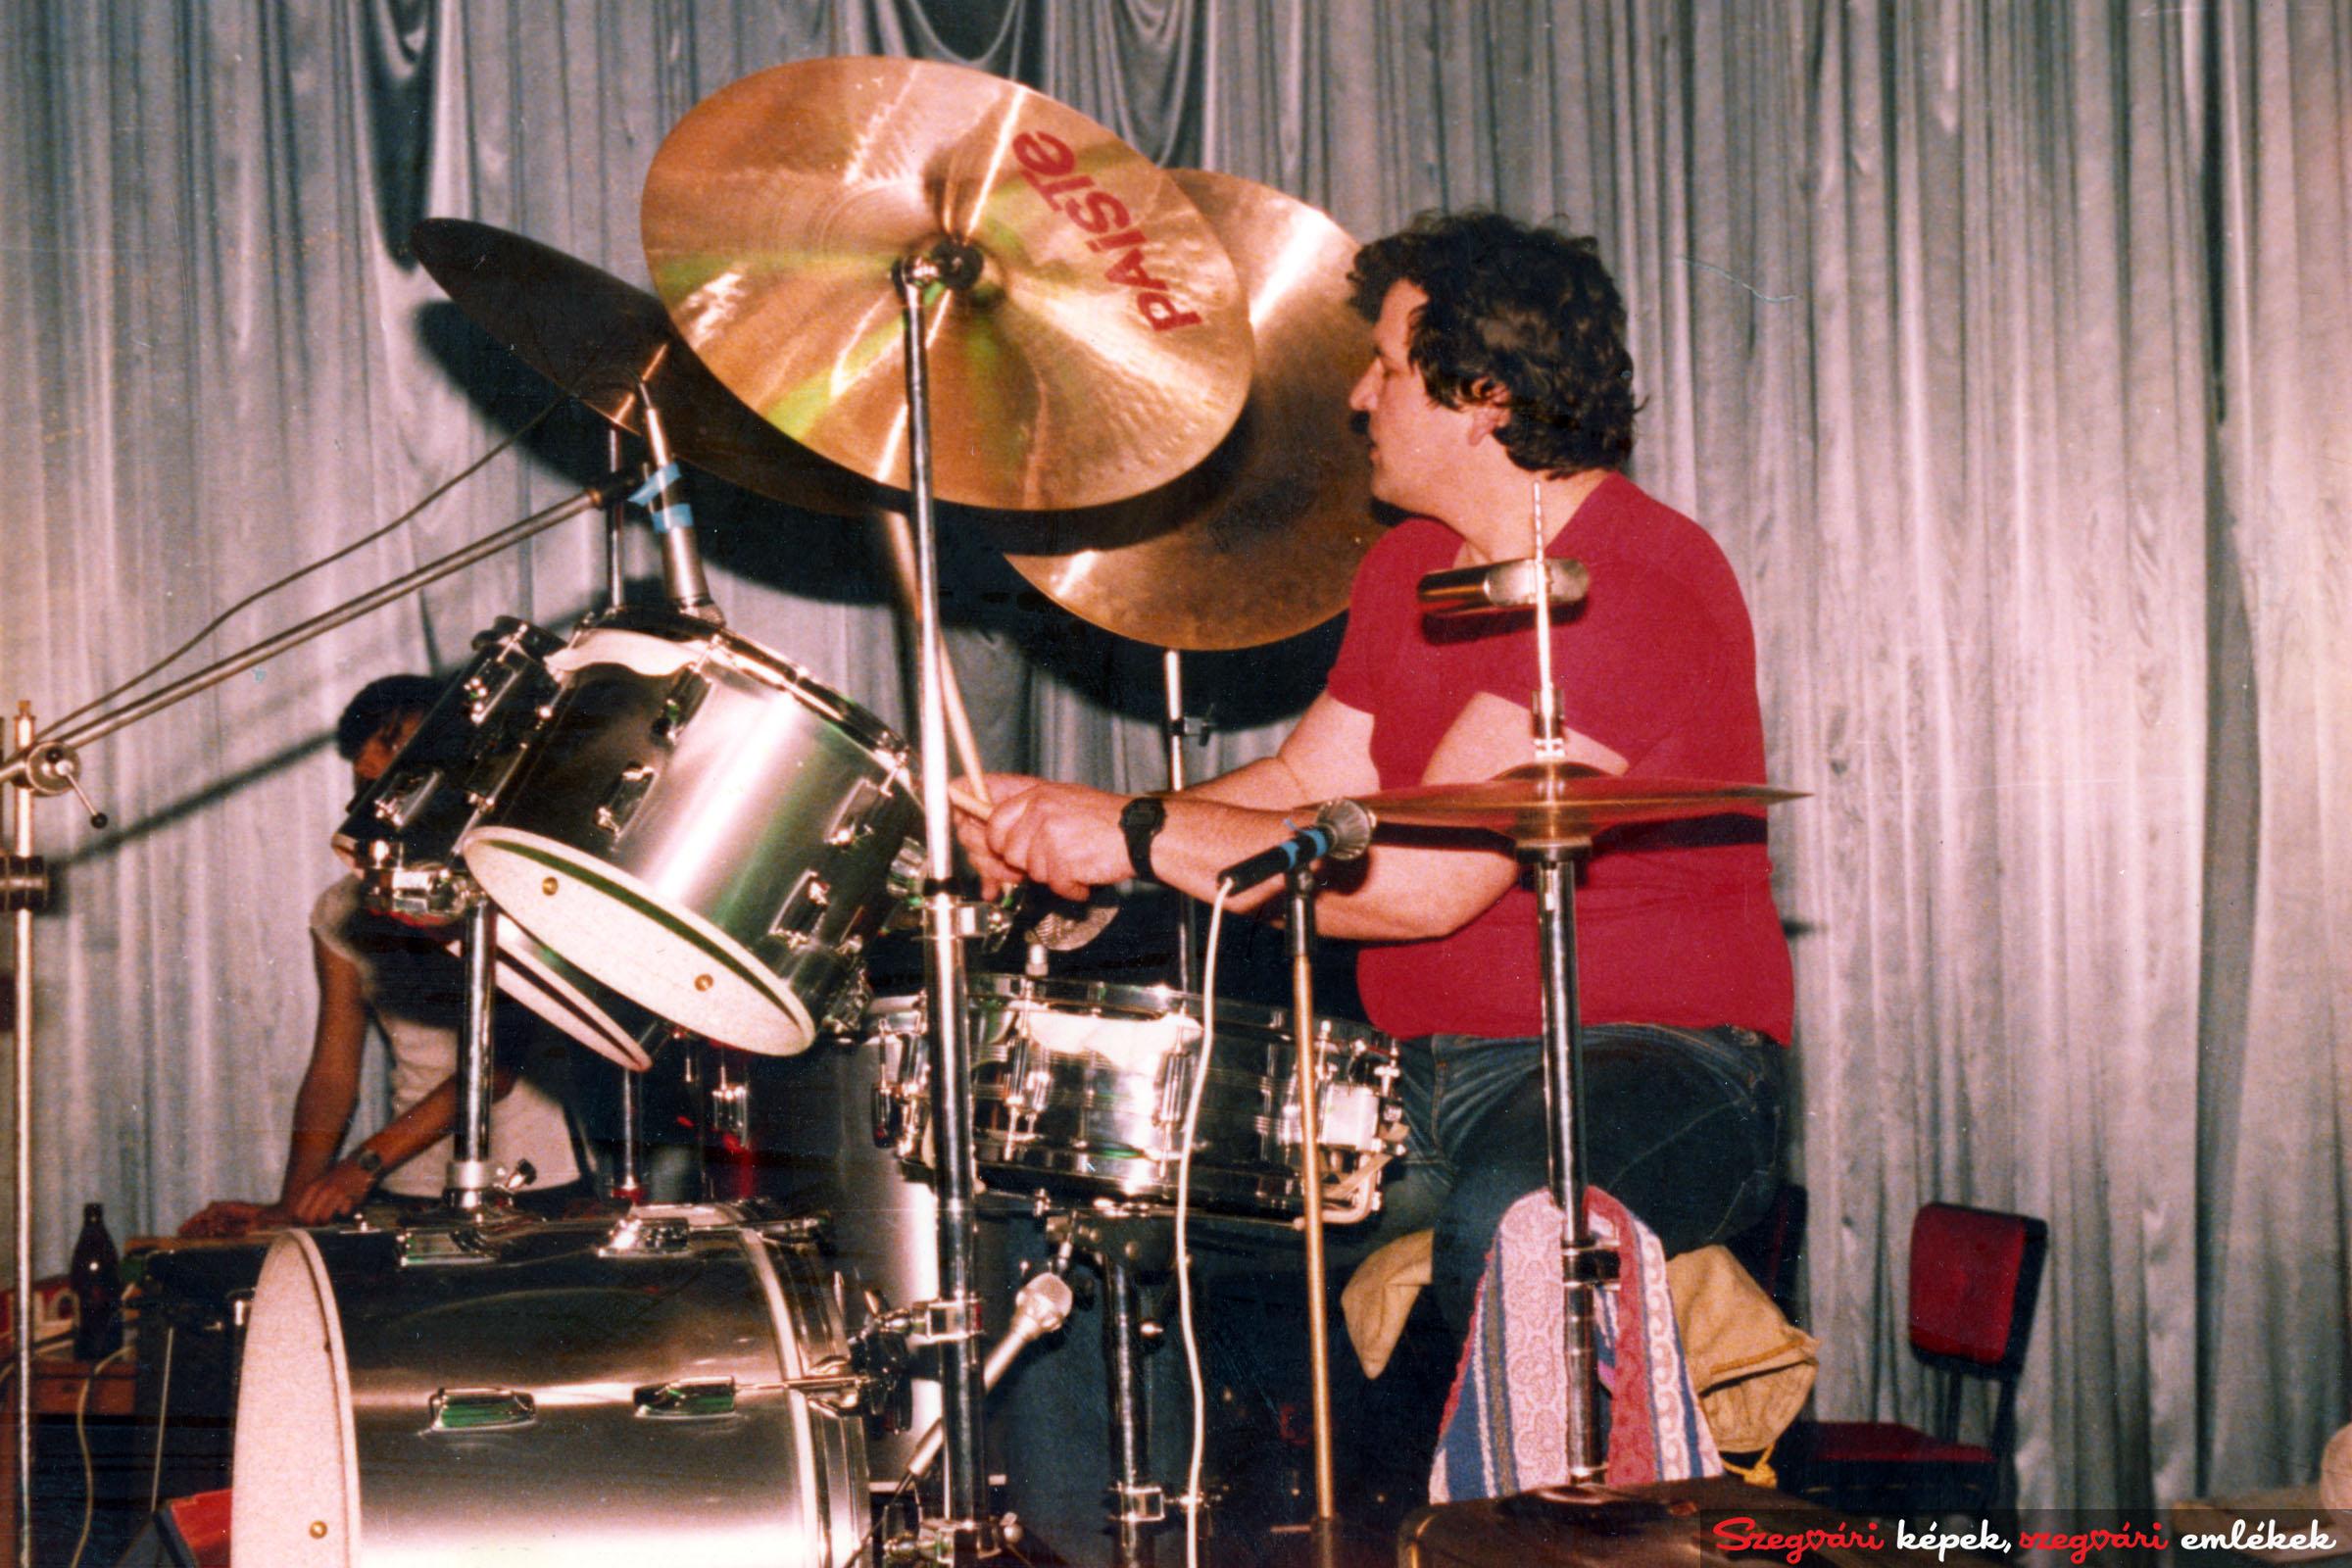 063 Lézer Rock 1980-1983. 006 – Fekete tulipántól a Lézerig,